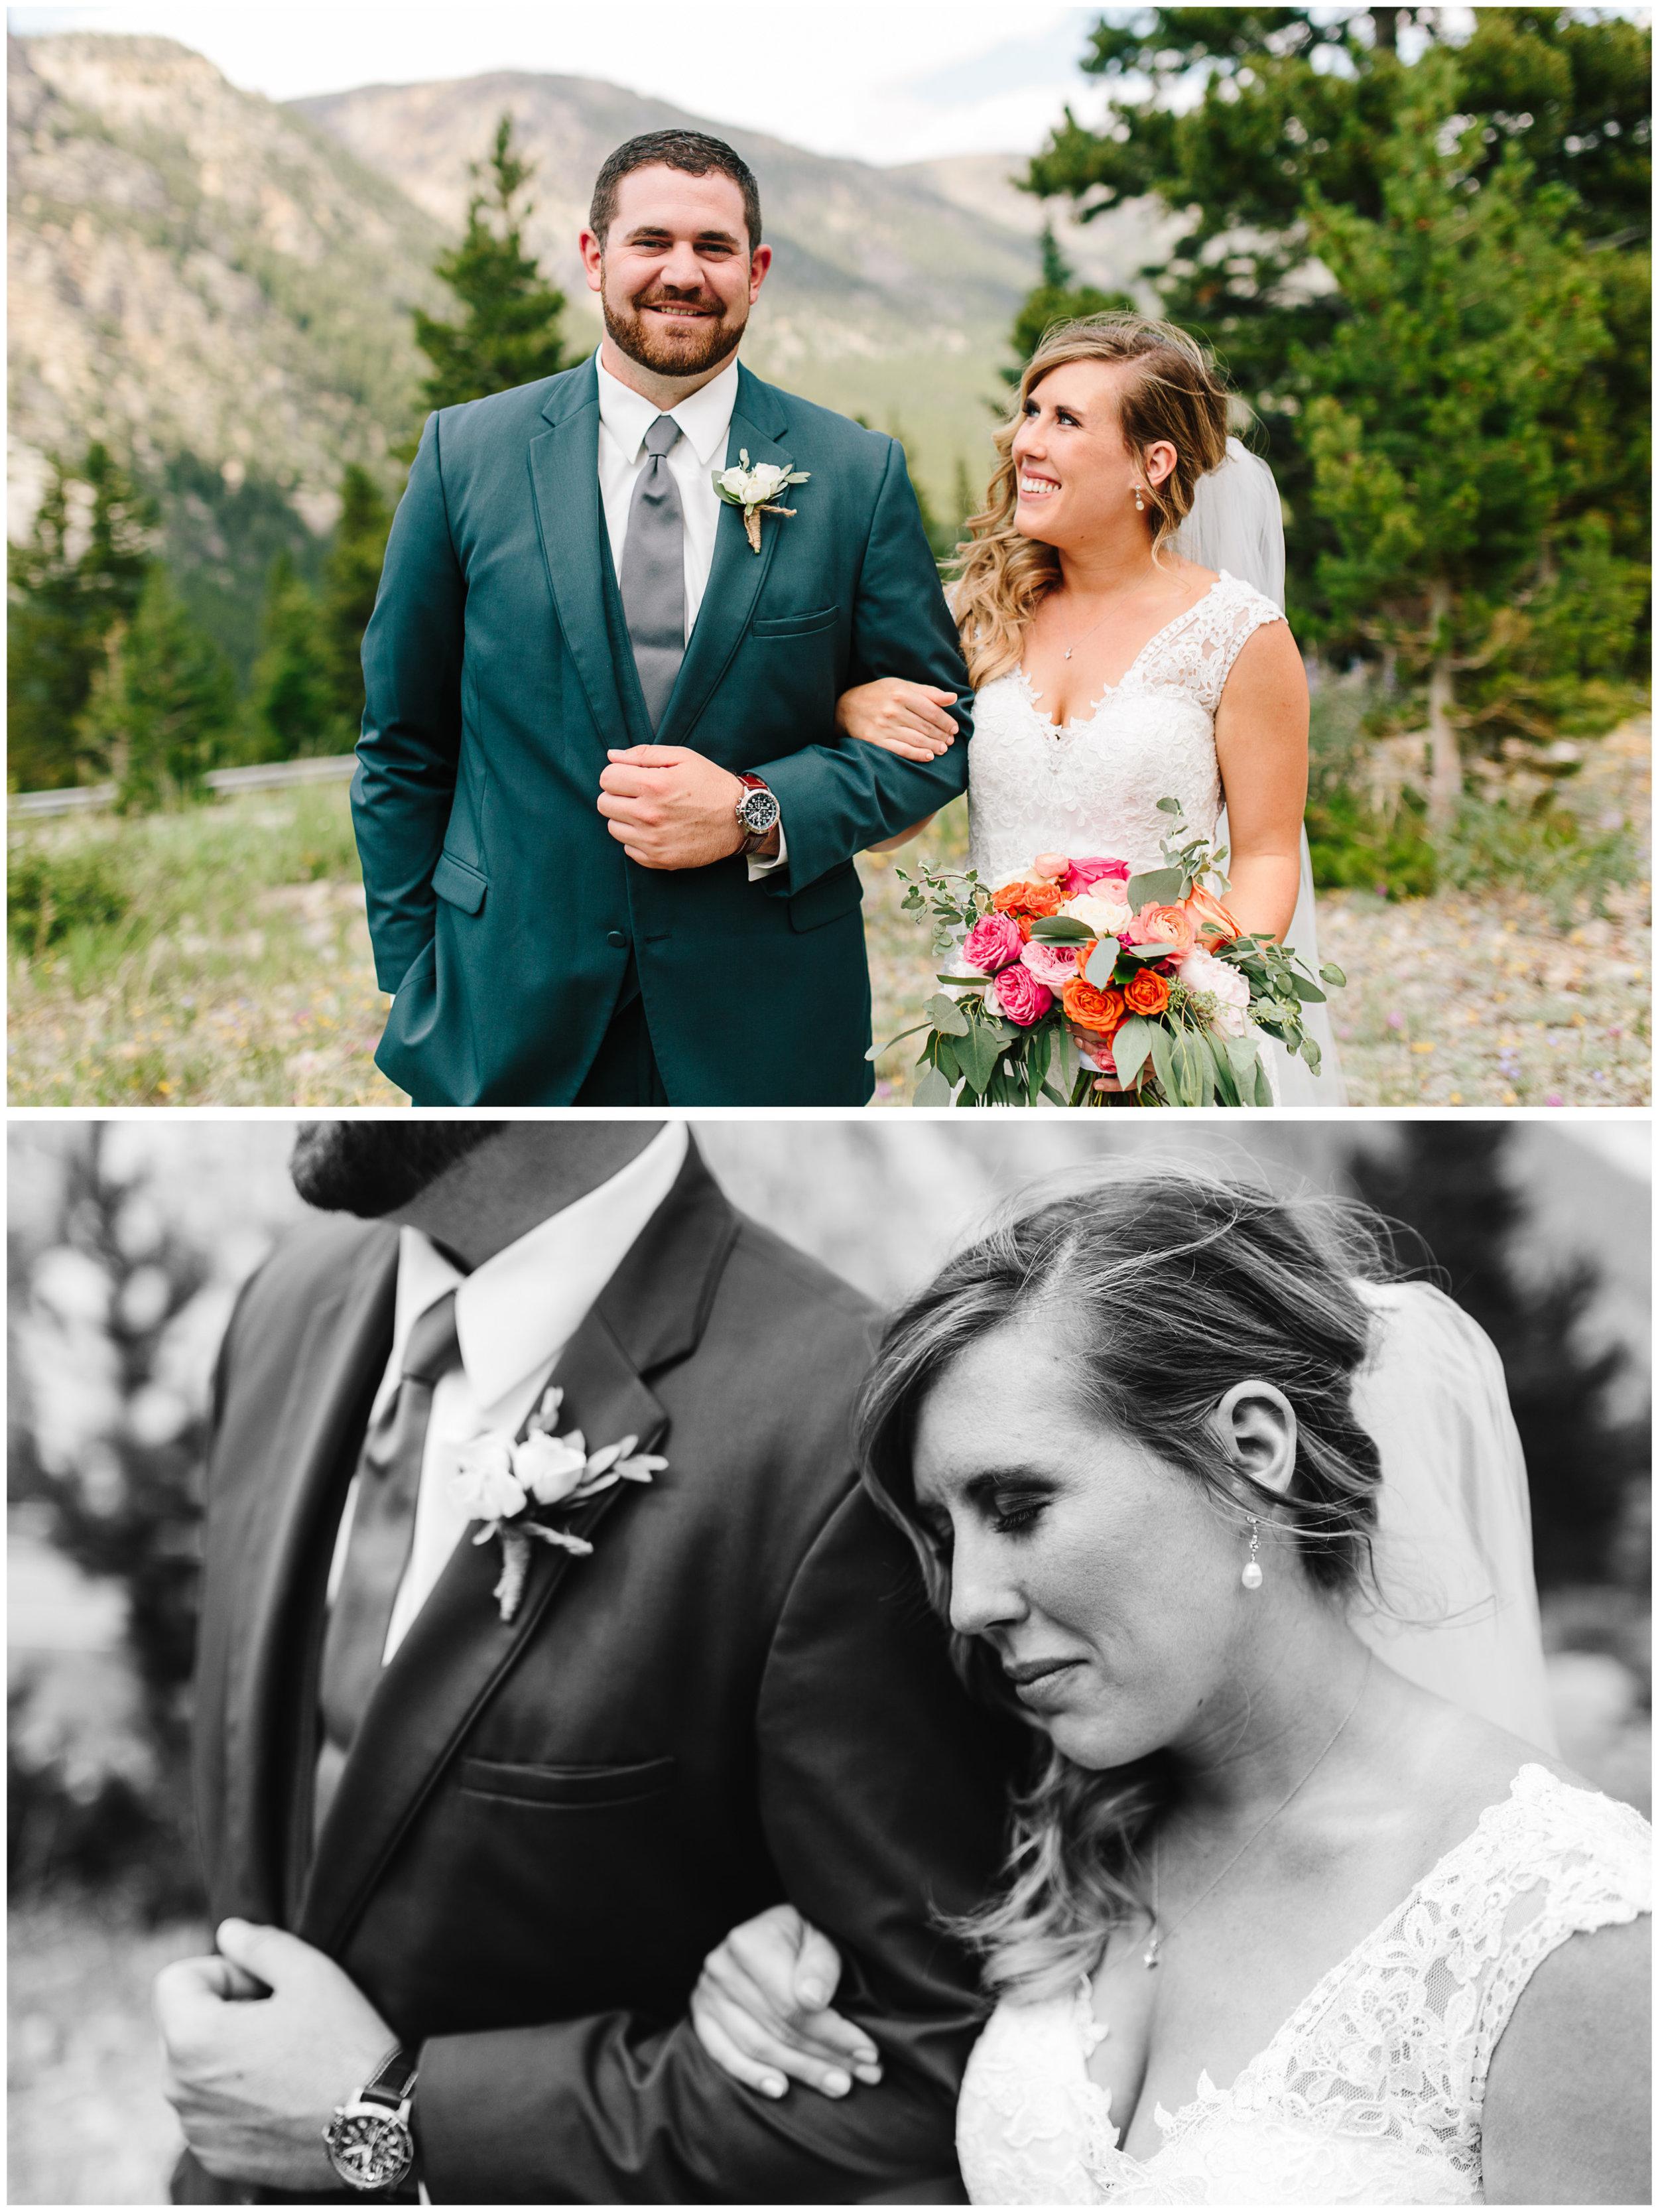 redlodge_montana_wedding_30.jpg